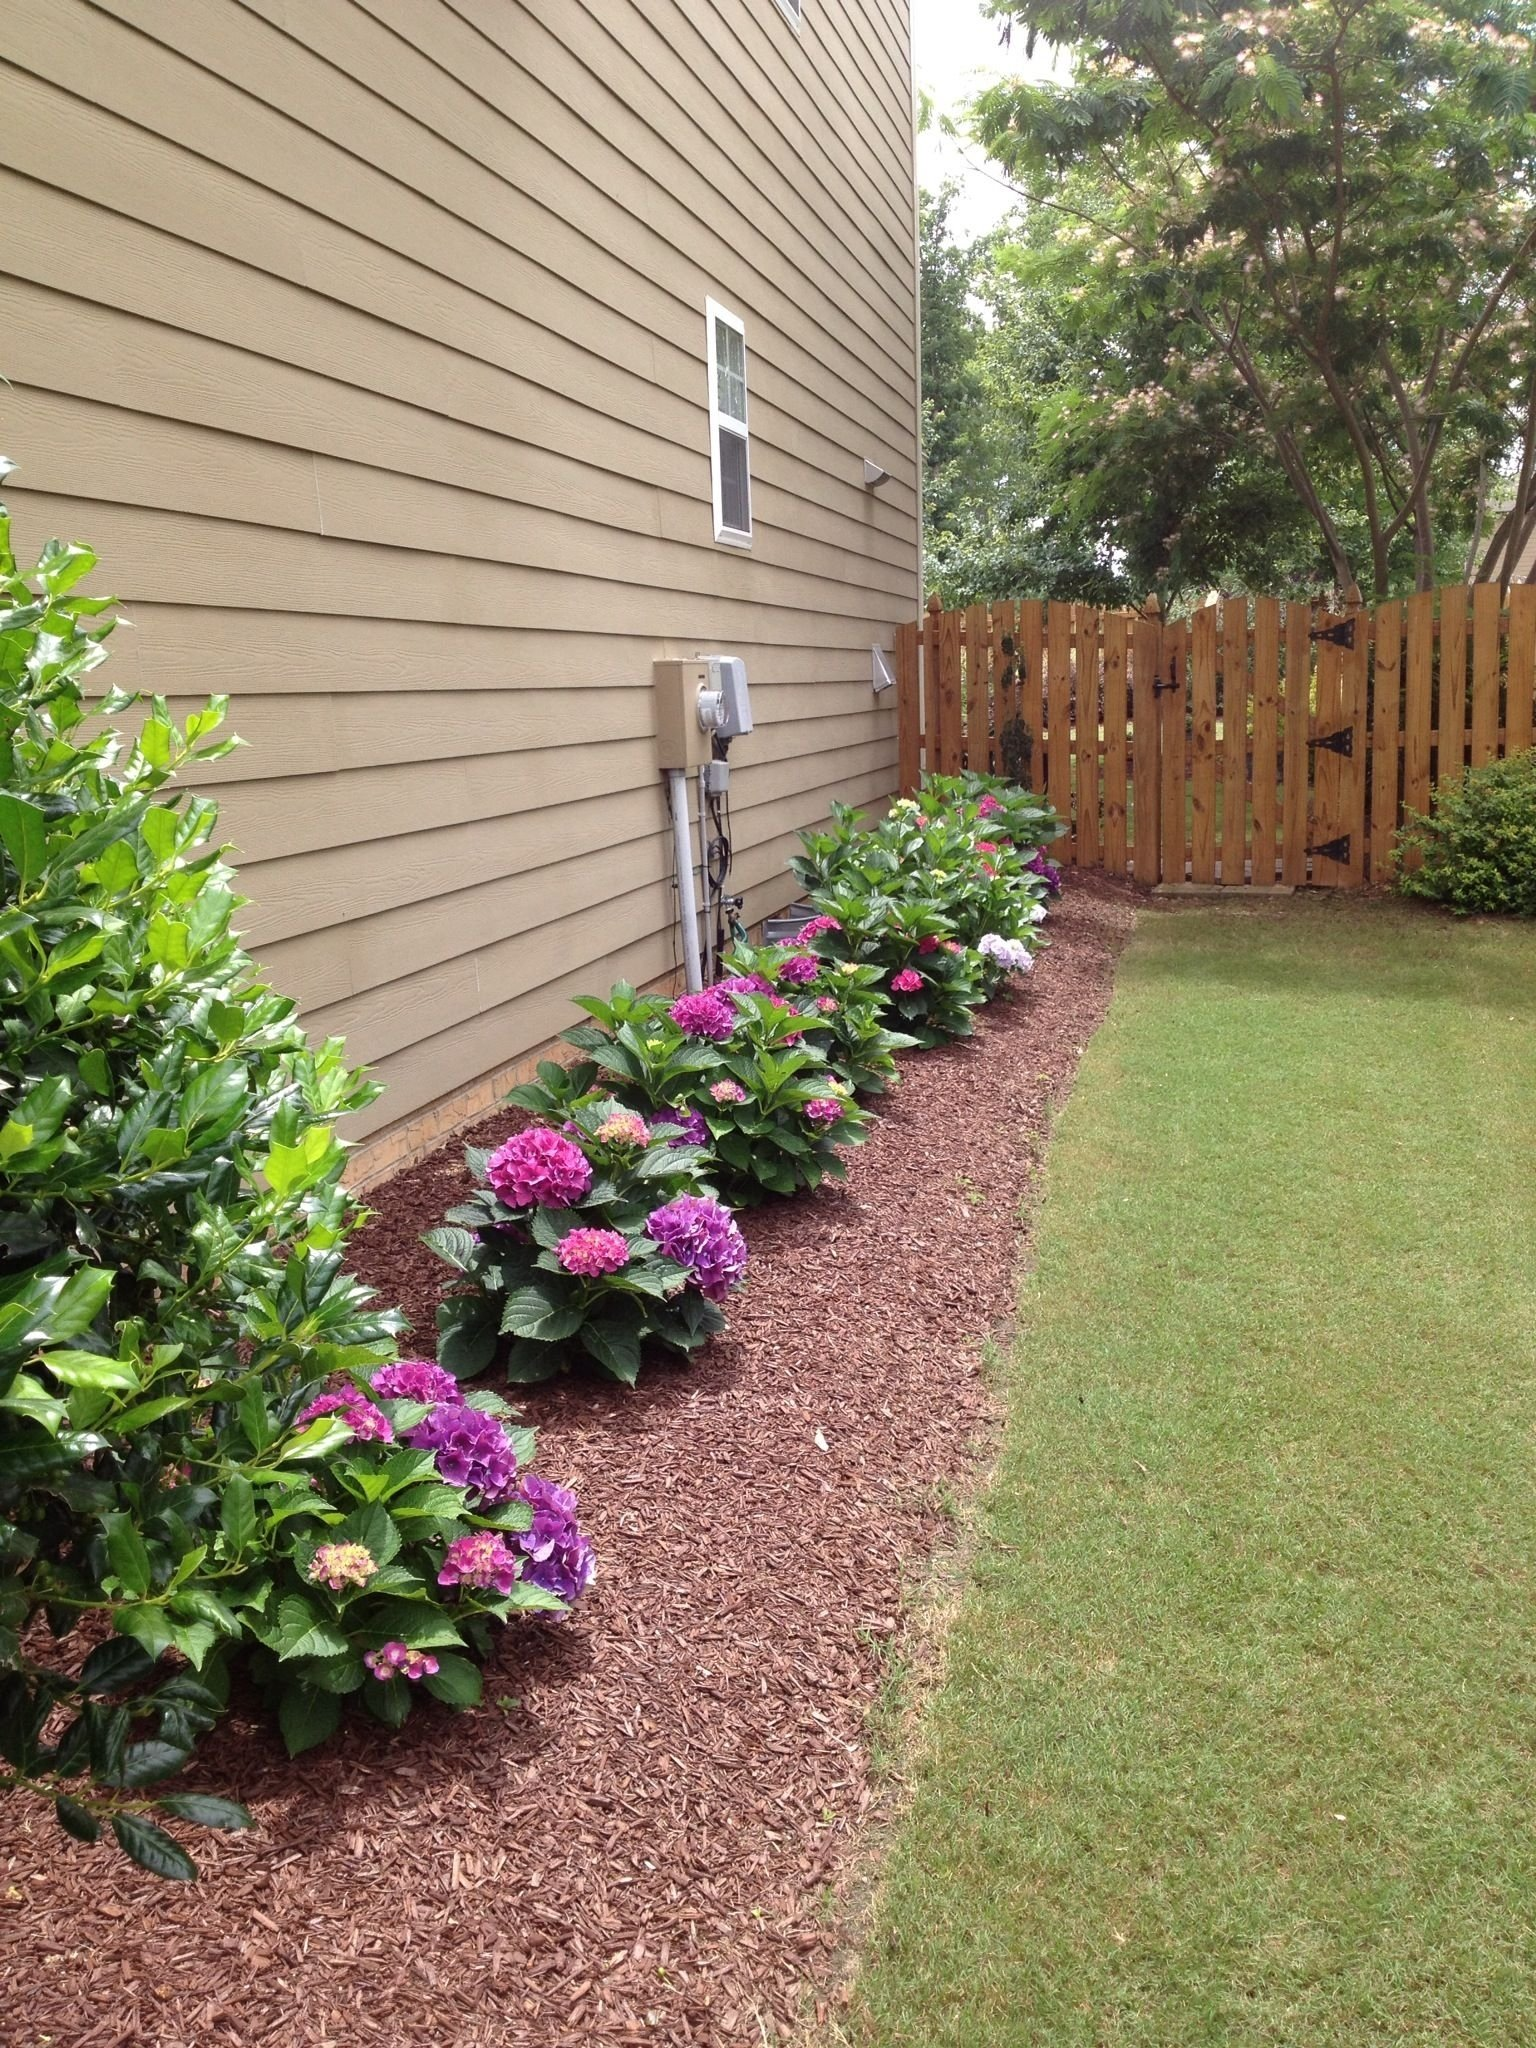 10 cheap but creative ideas for your garden 4 | side yard